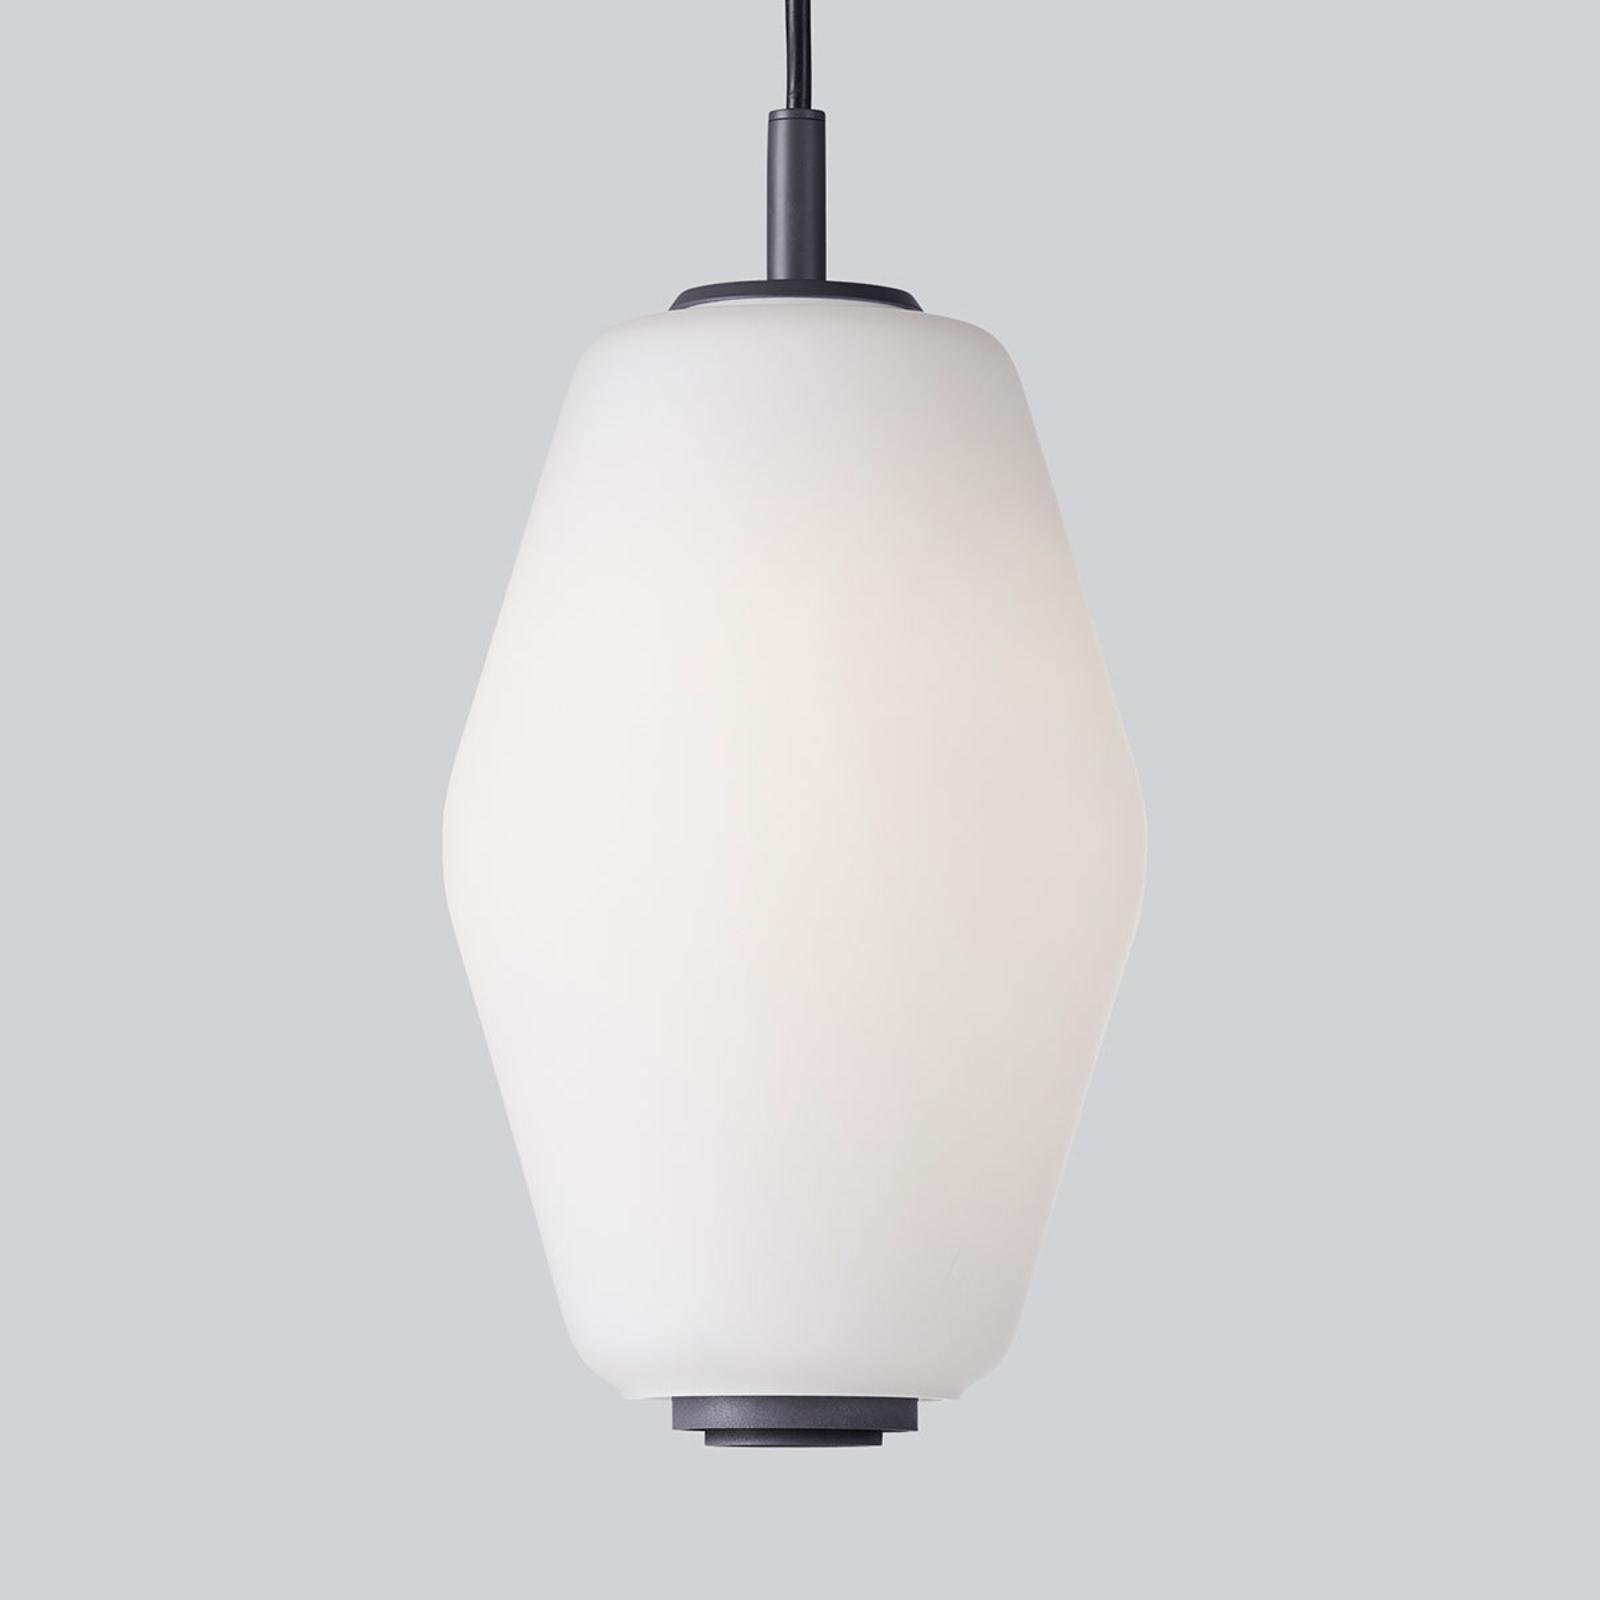 Northern Dahl hanglamp small donkergrijs